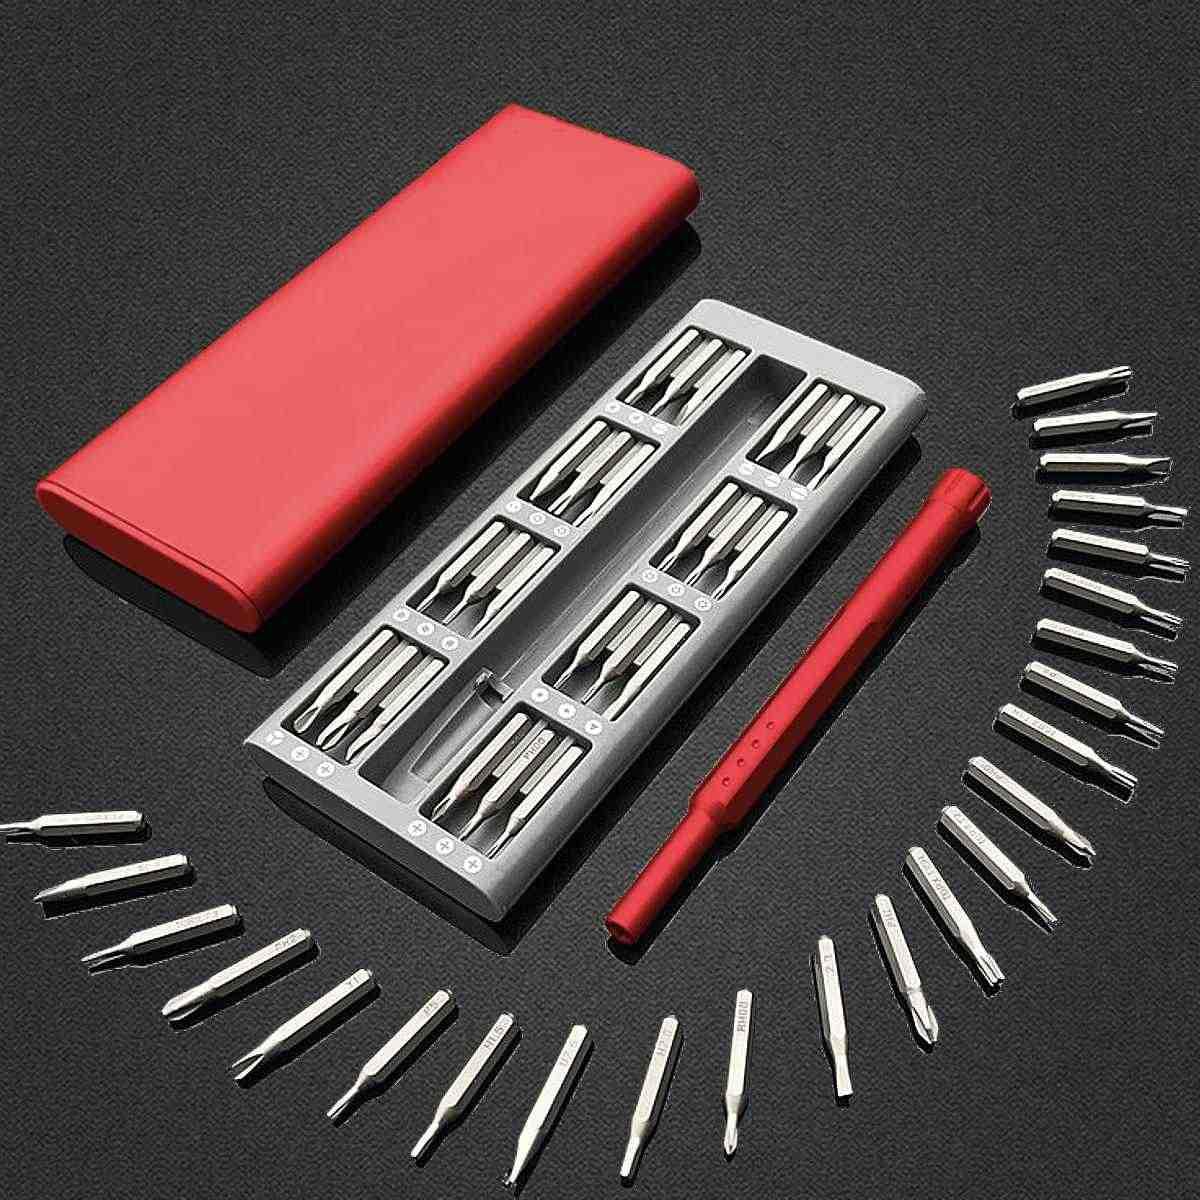 Mini Screwdriver Kit suit for Xiaomi Mijia Wiha Daily Use 25 Precision Magnetic Bits Box Screw Driver Smart Home Set Tools